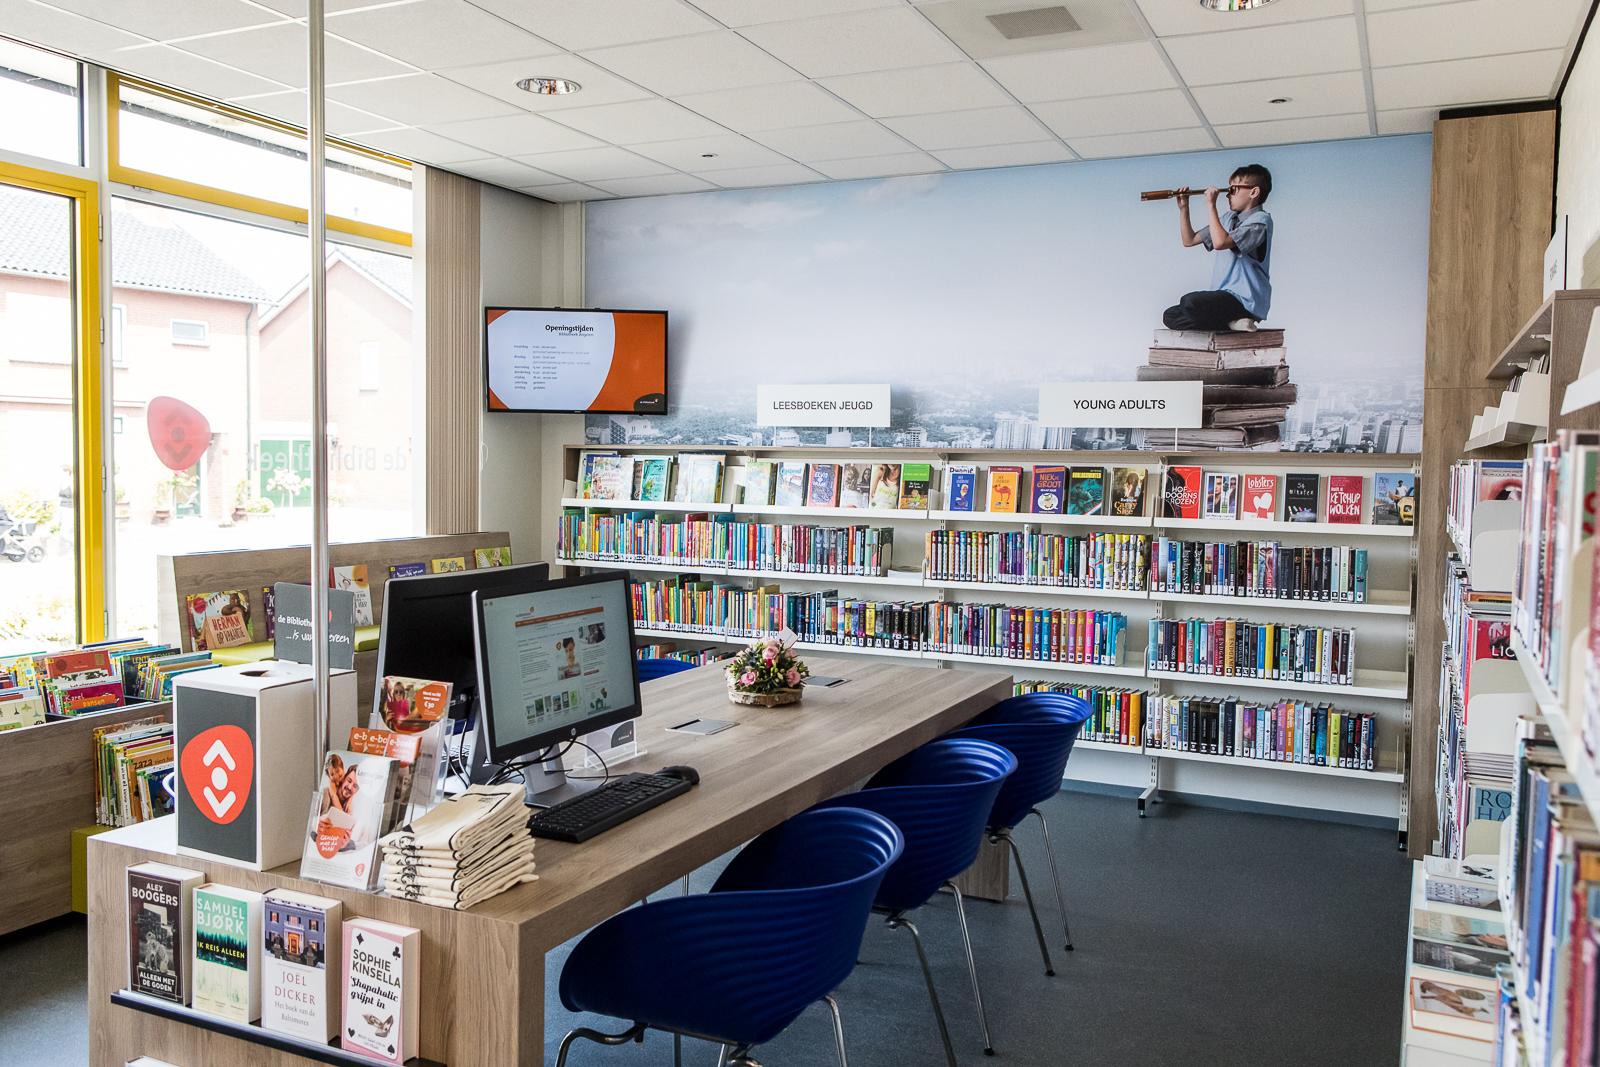 [social media] 2017-06-02_Opening bibliotheek Angeren_Marcel Krijgsman - 009.jpg (1536345 bytes)